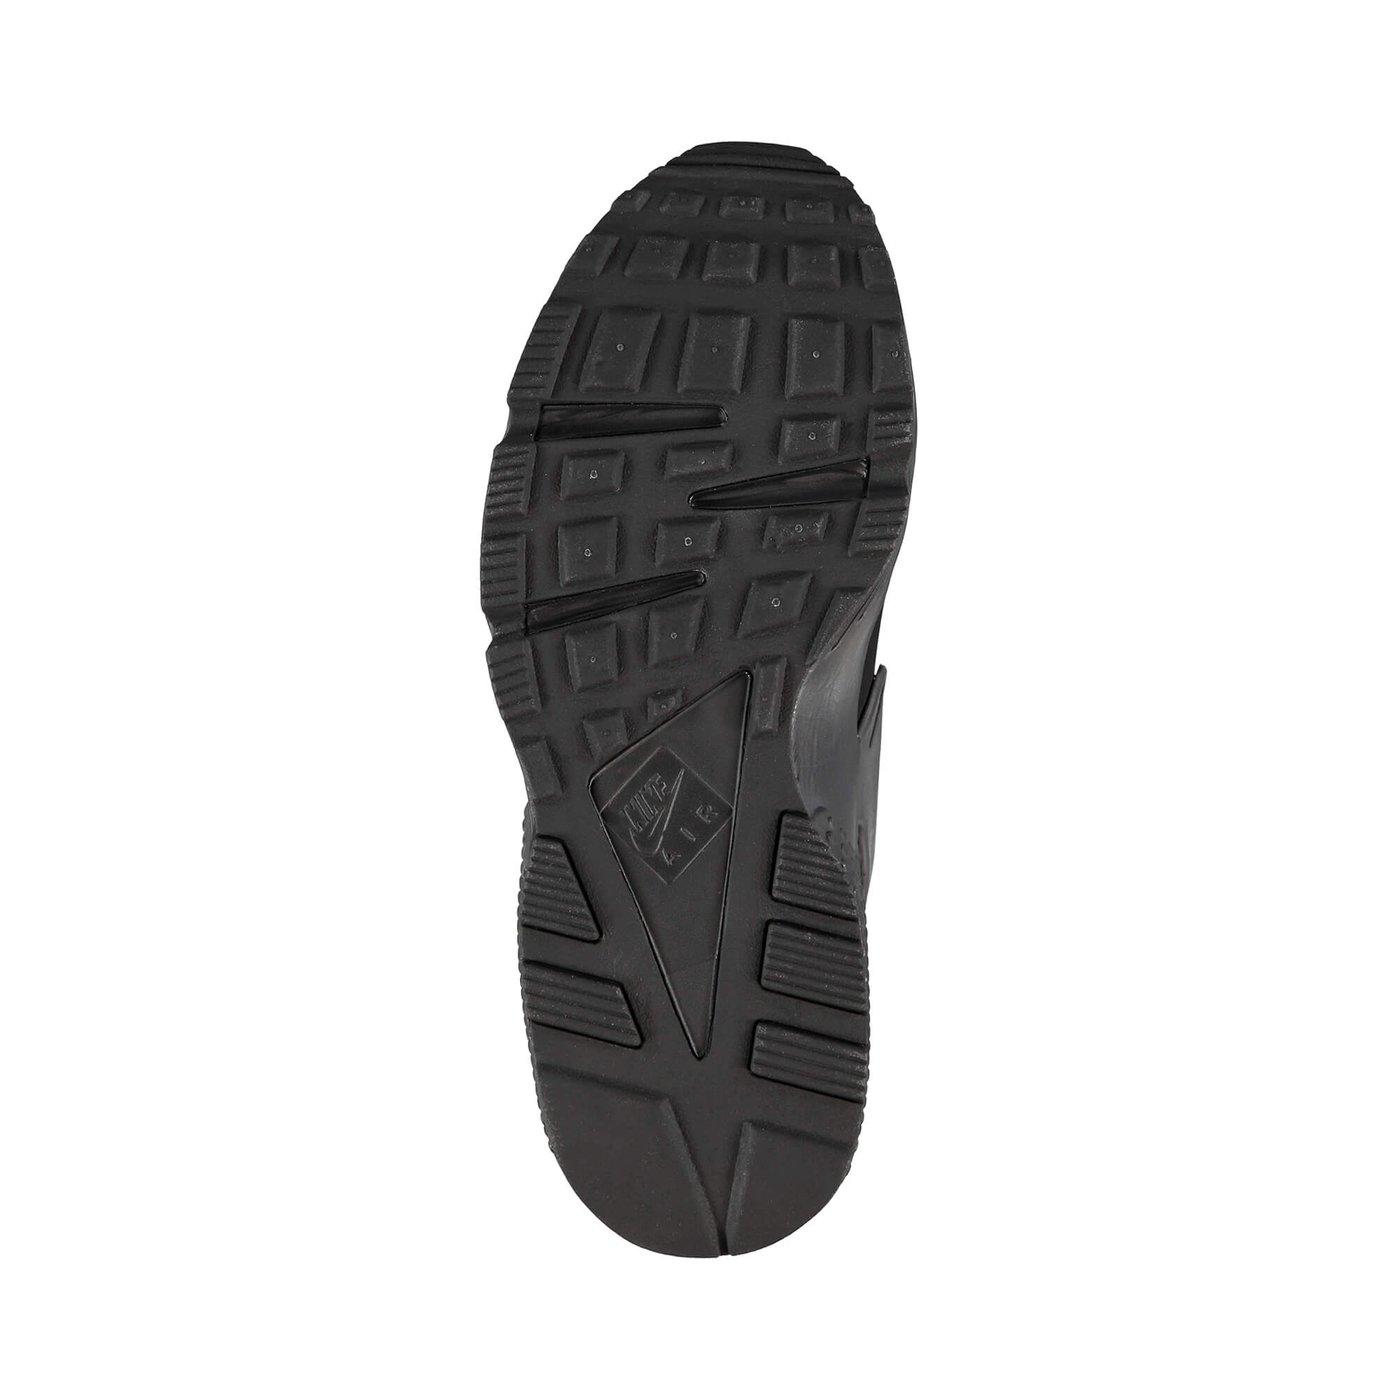 Nike Air Huarache Erkek Siyah Spor Ayakkabı